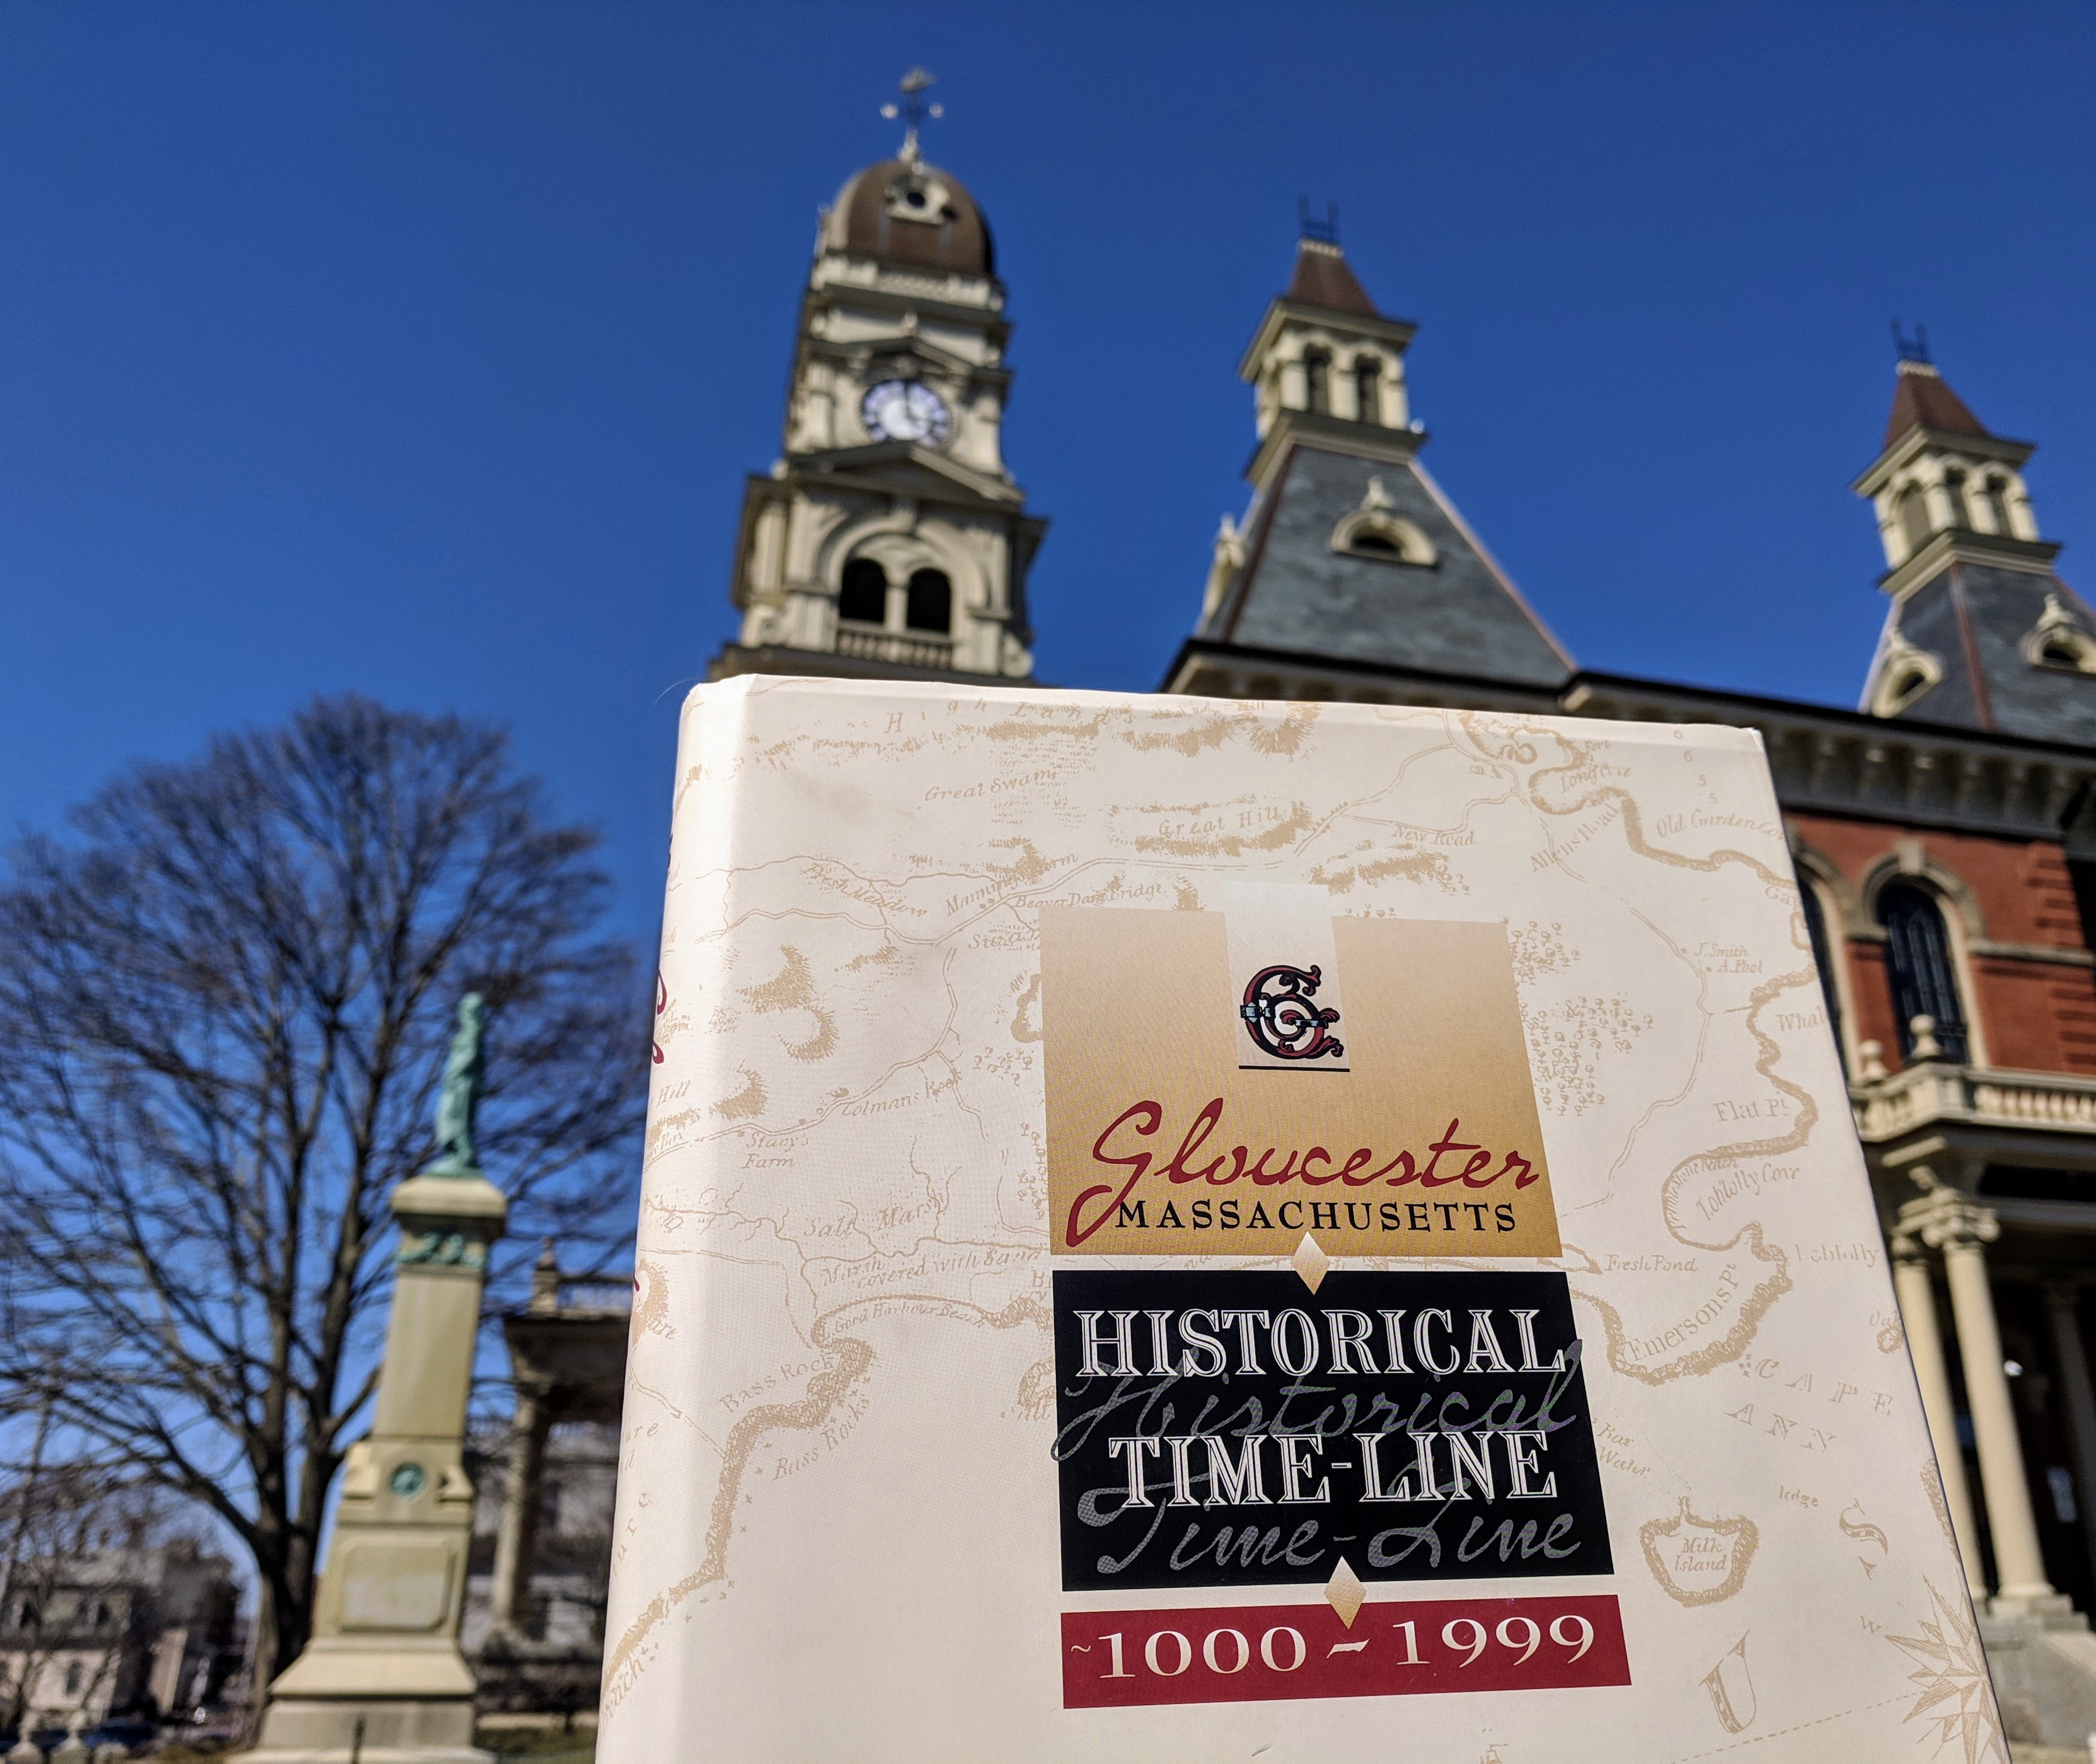 Gloucester Massachusetts archives timeline book_20190411_city hall_© Ray ed Sarah Dunlop © photo catherine ryan